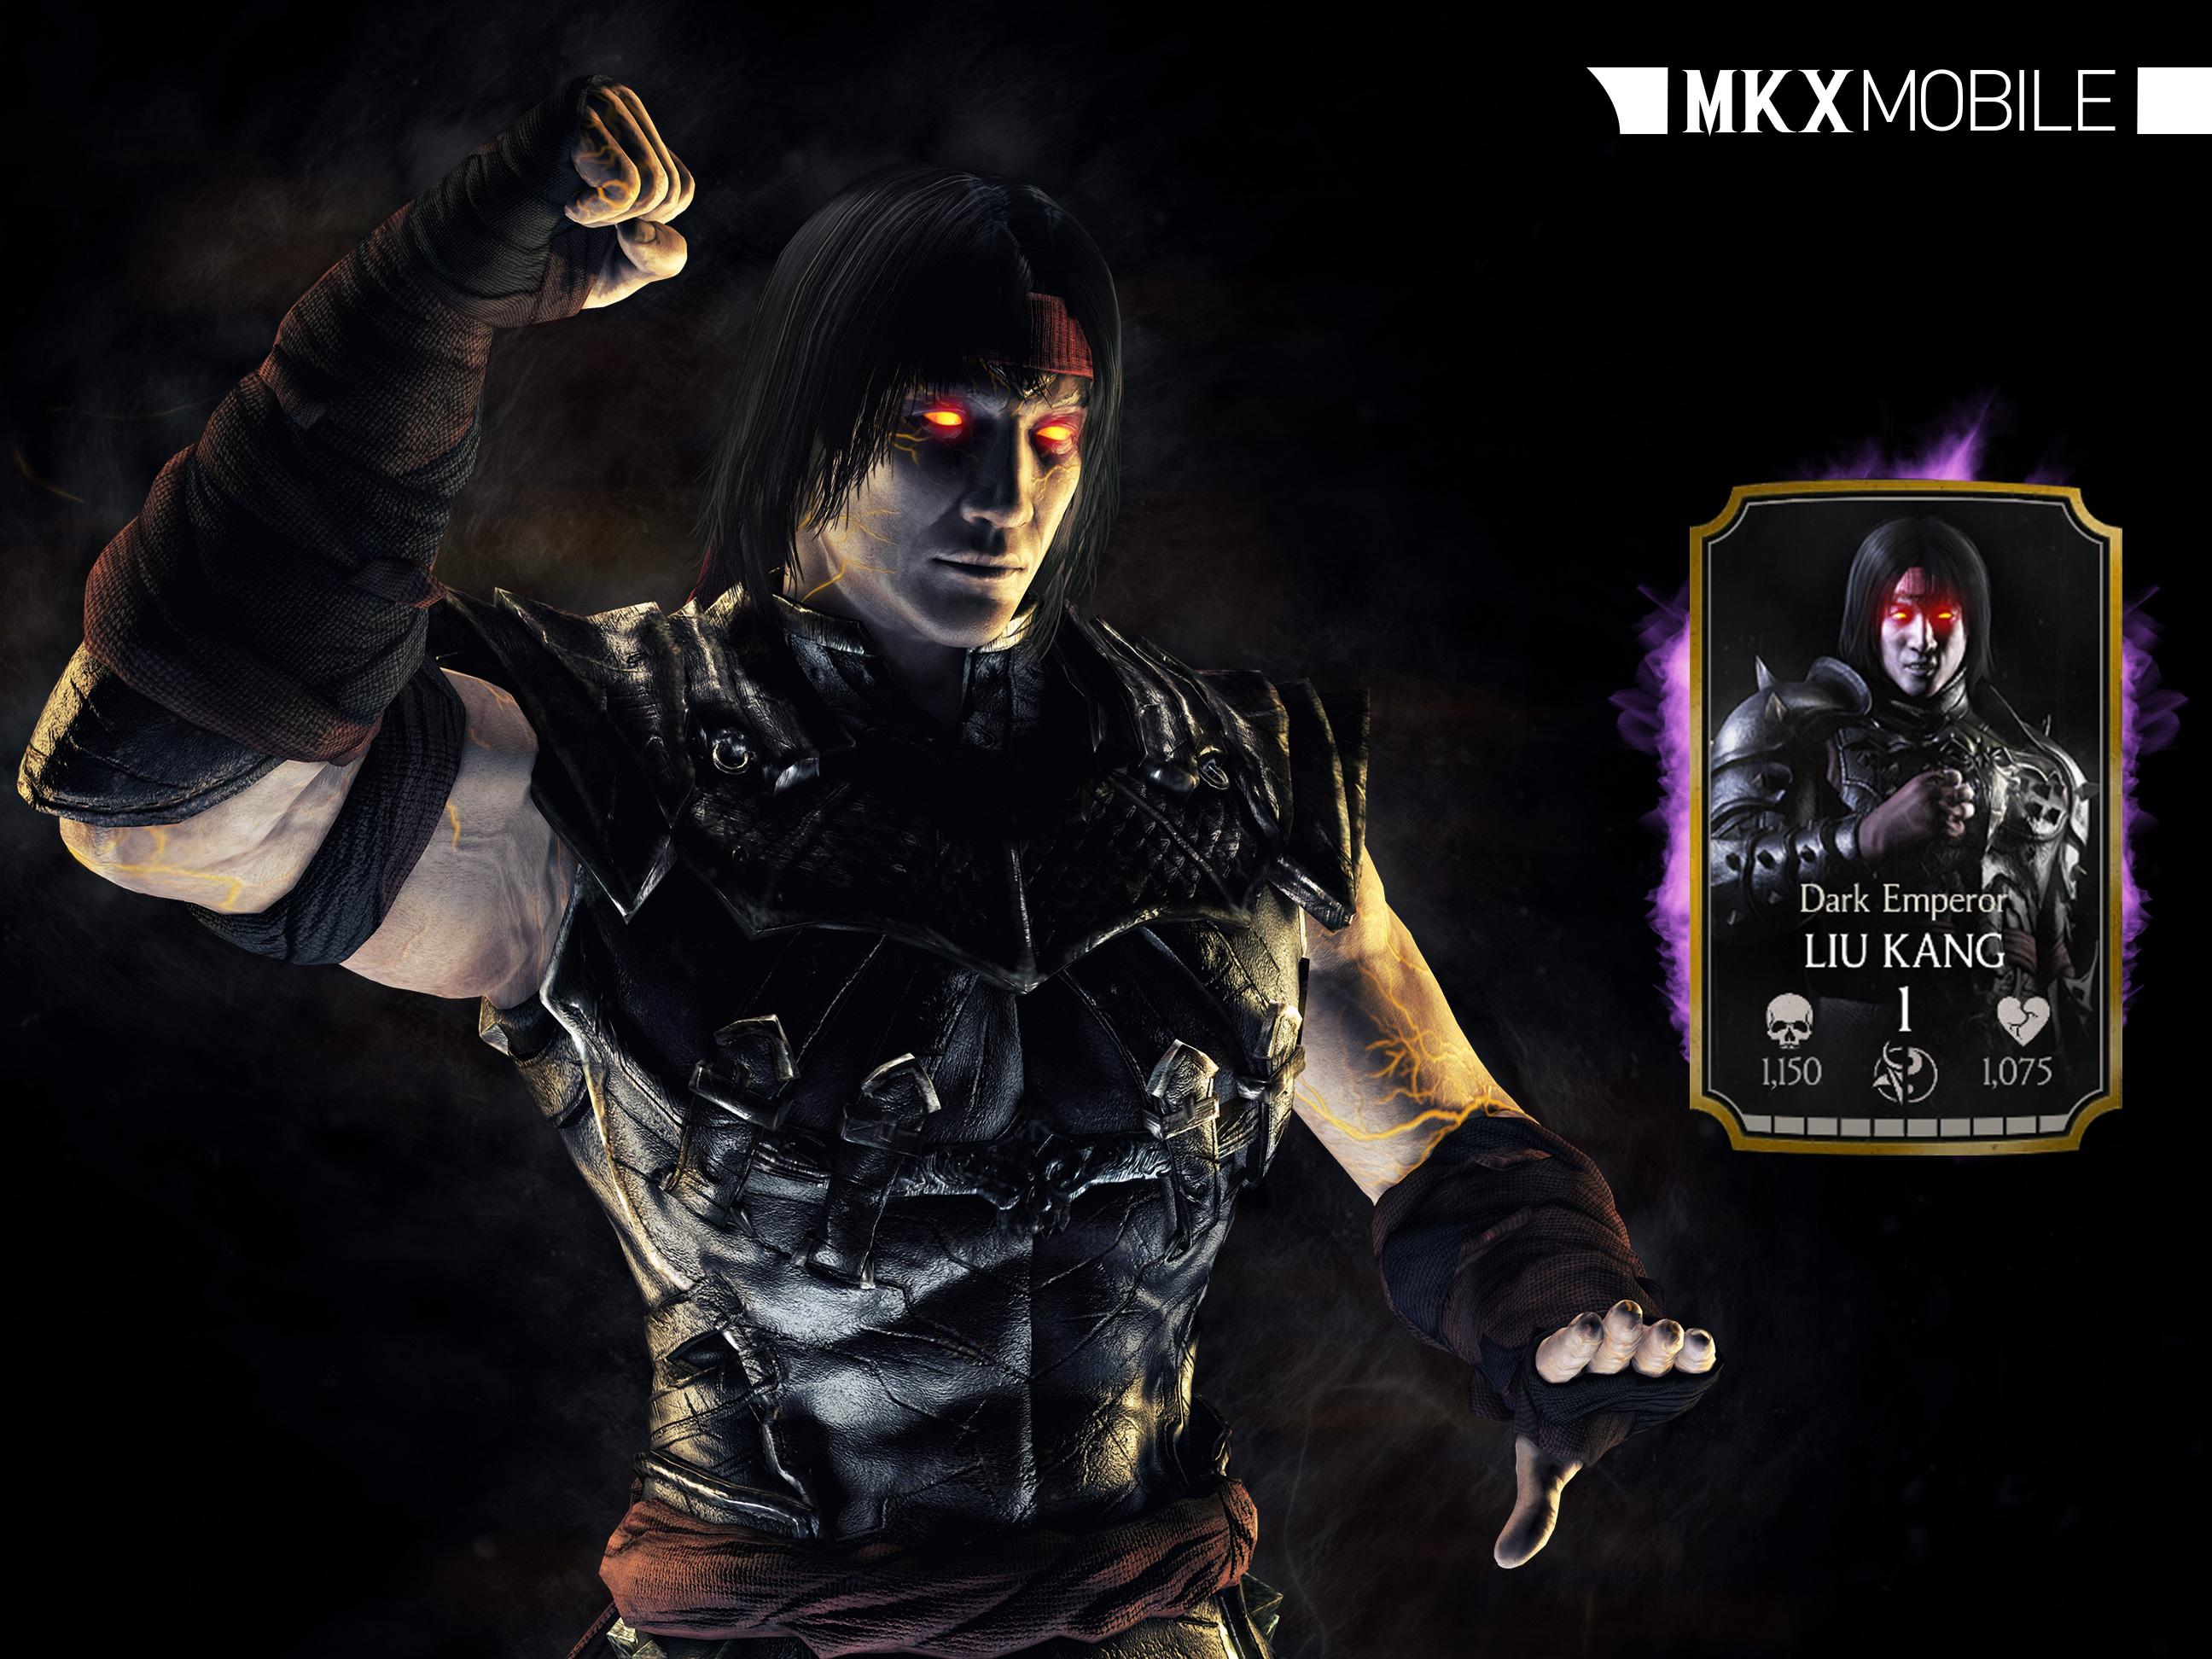 Dark Emperor Liu Kang Mortal Kombat X Mobile » Mortal Kombat